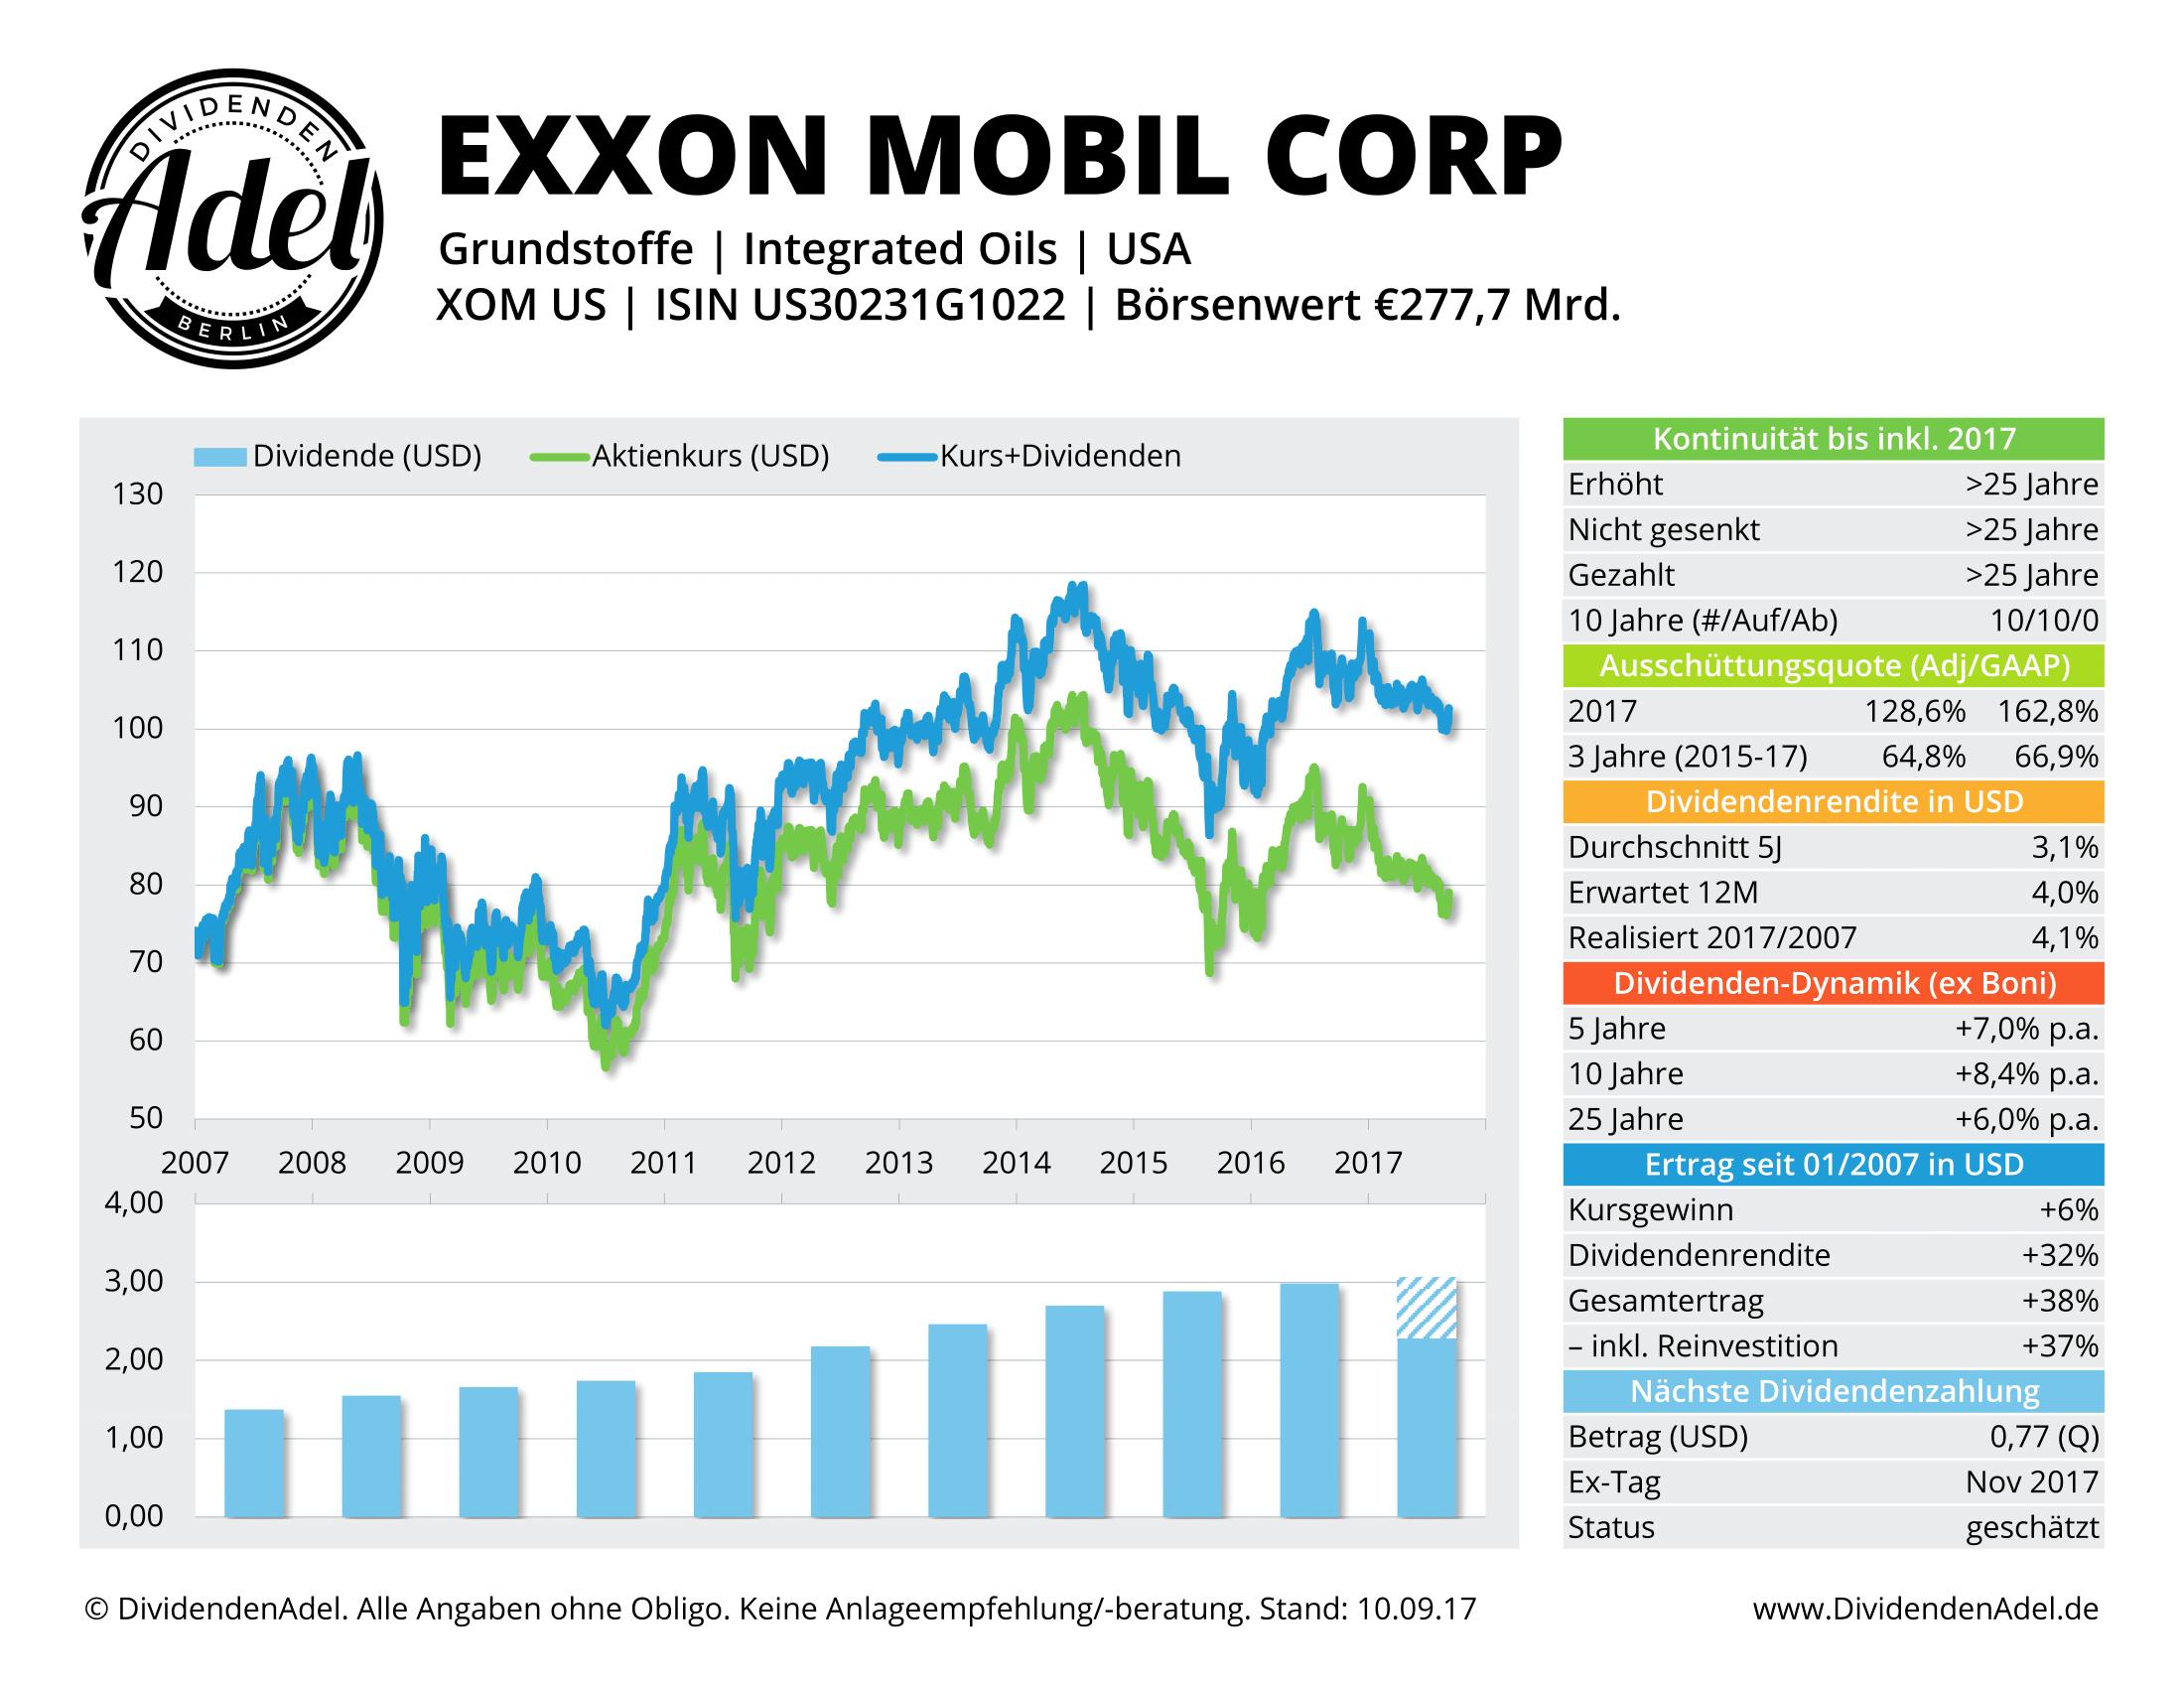 EXXON MOBIL CORP DividendenAdel-Profil